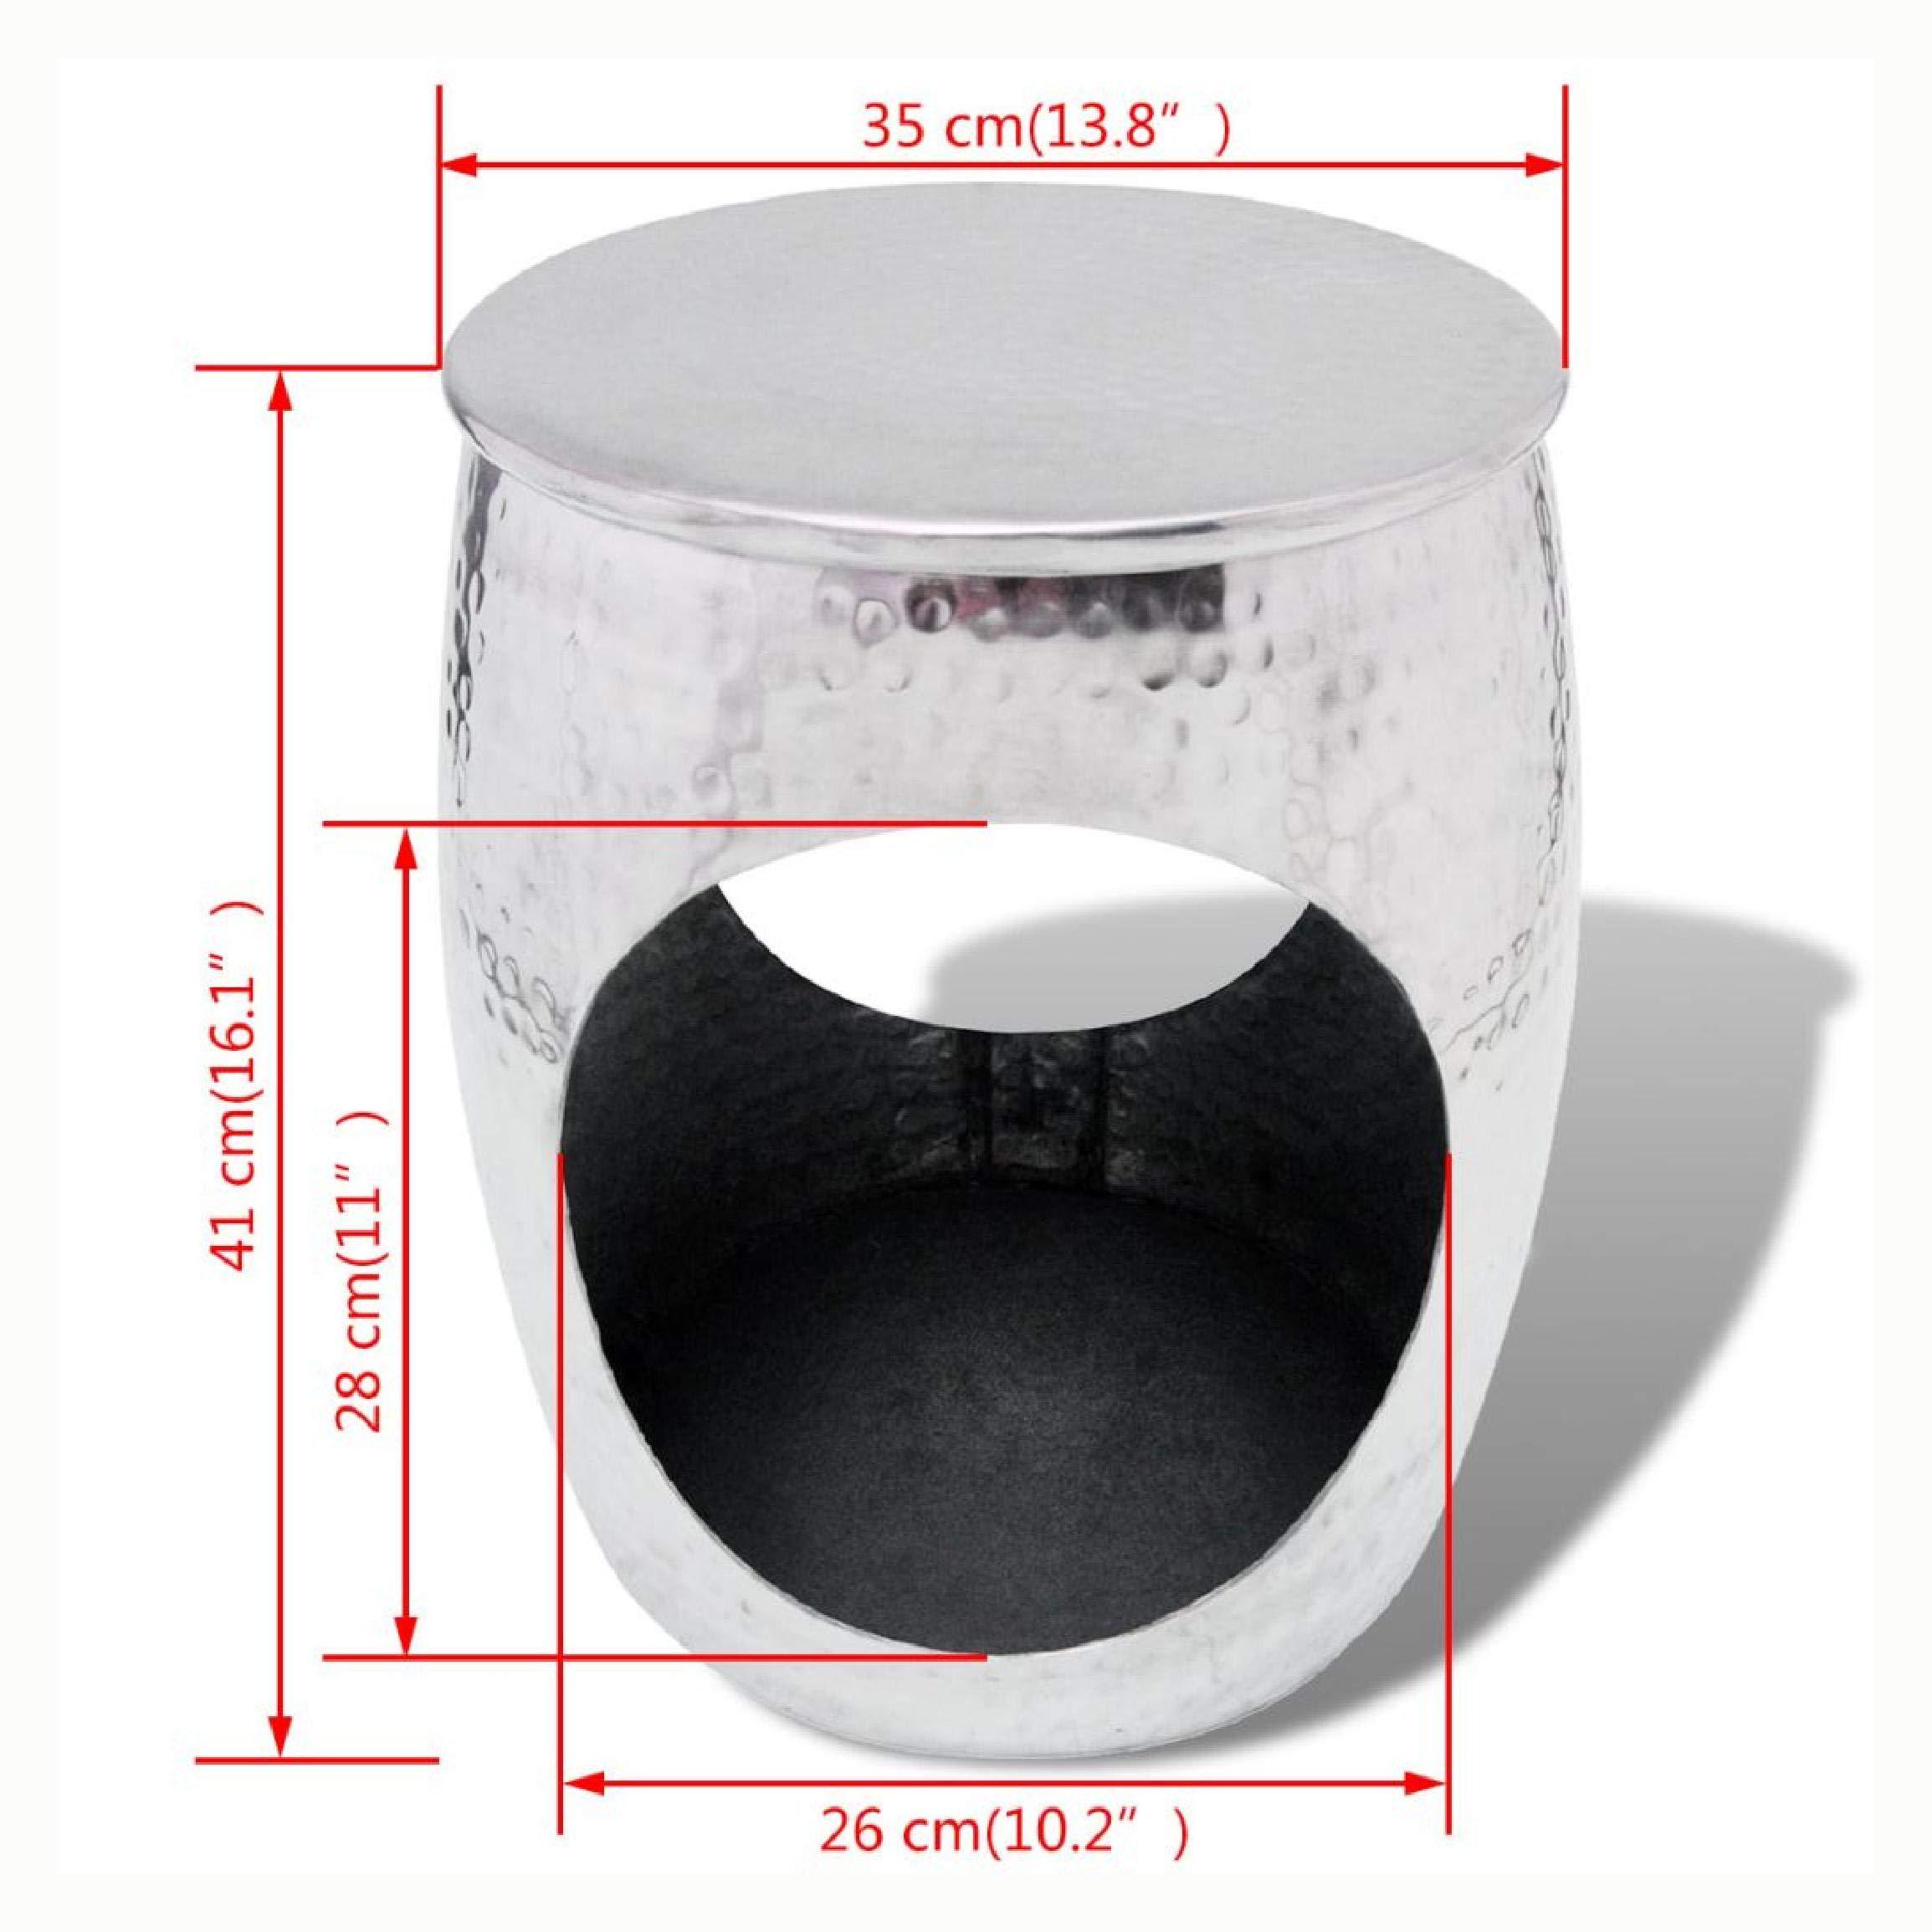 K&A Company Hocker/Side Table Barrel Shape Aluminum Silver by K&A Company (Image #4)